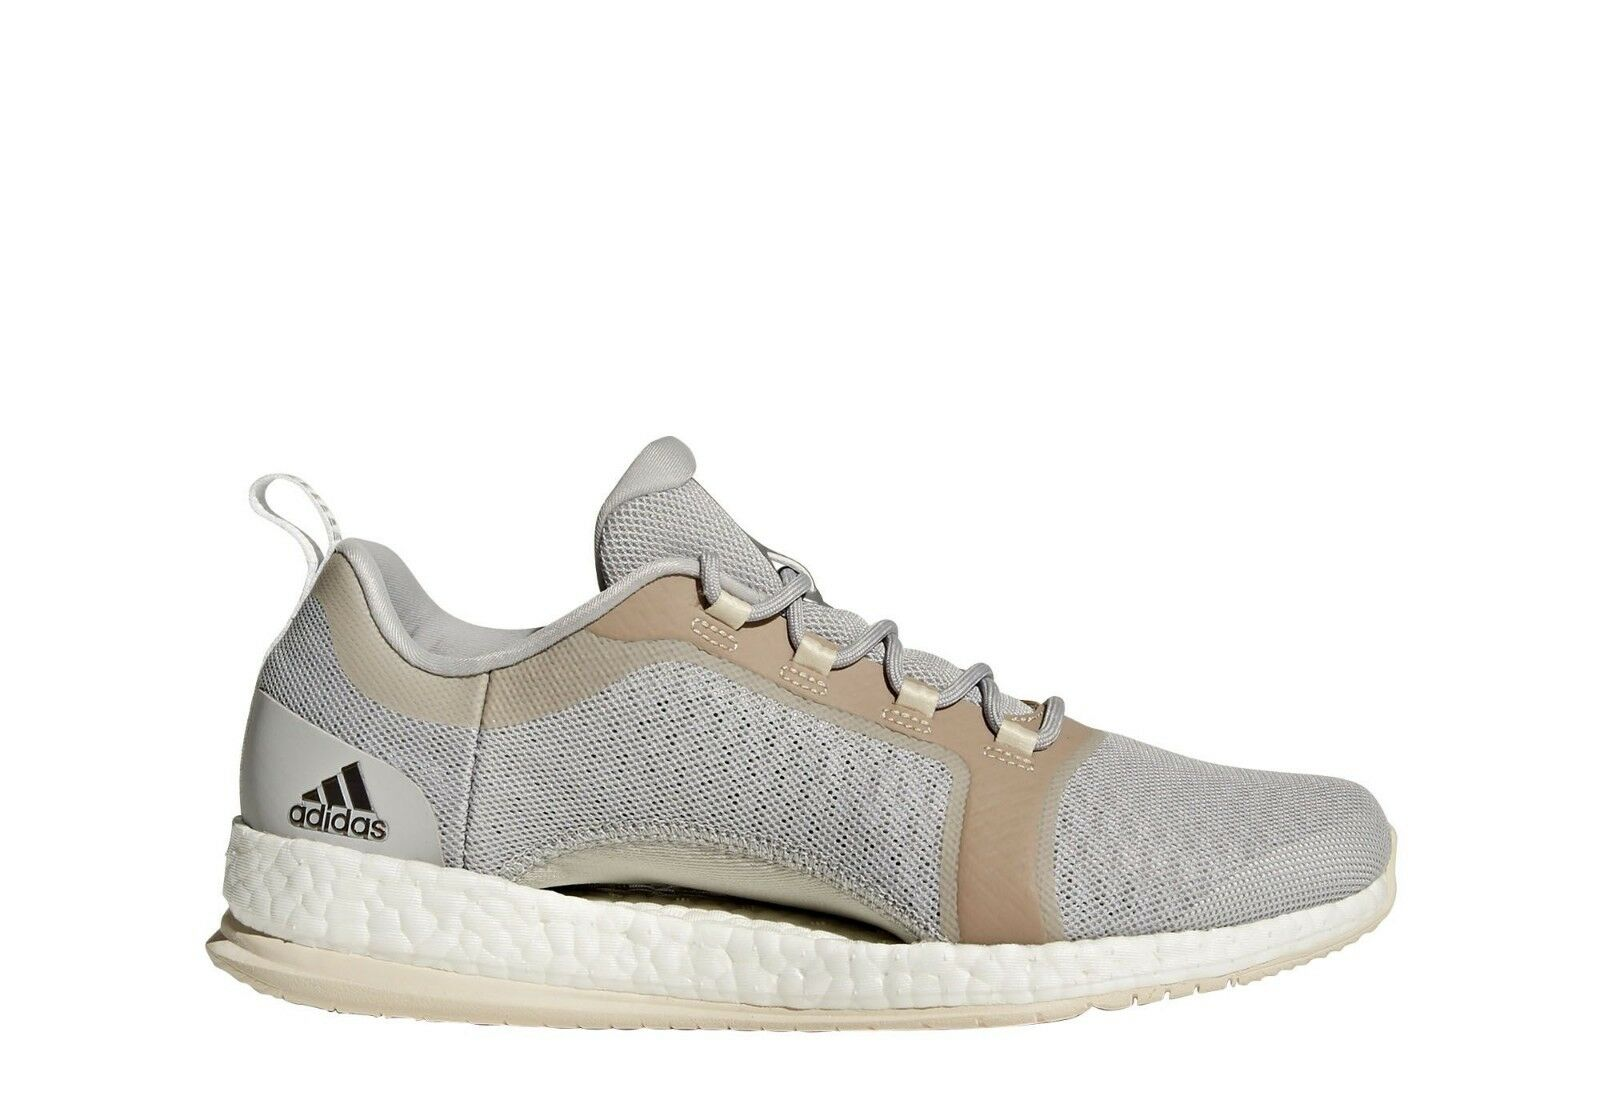 Adidas Woman pureaumentar x Tr 2 bb3286